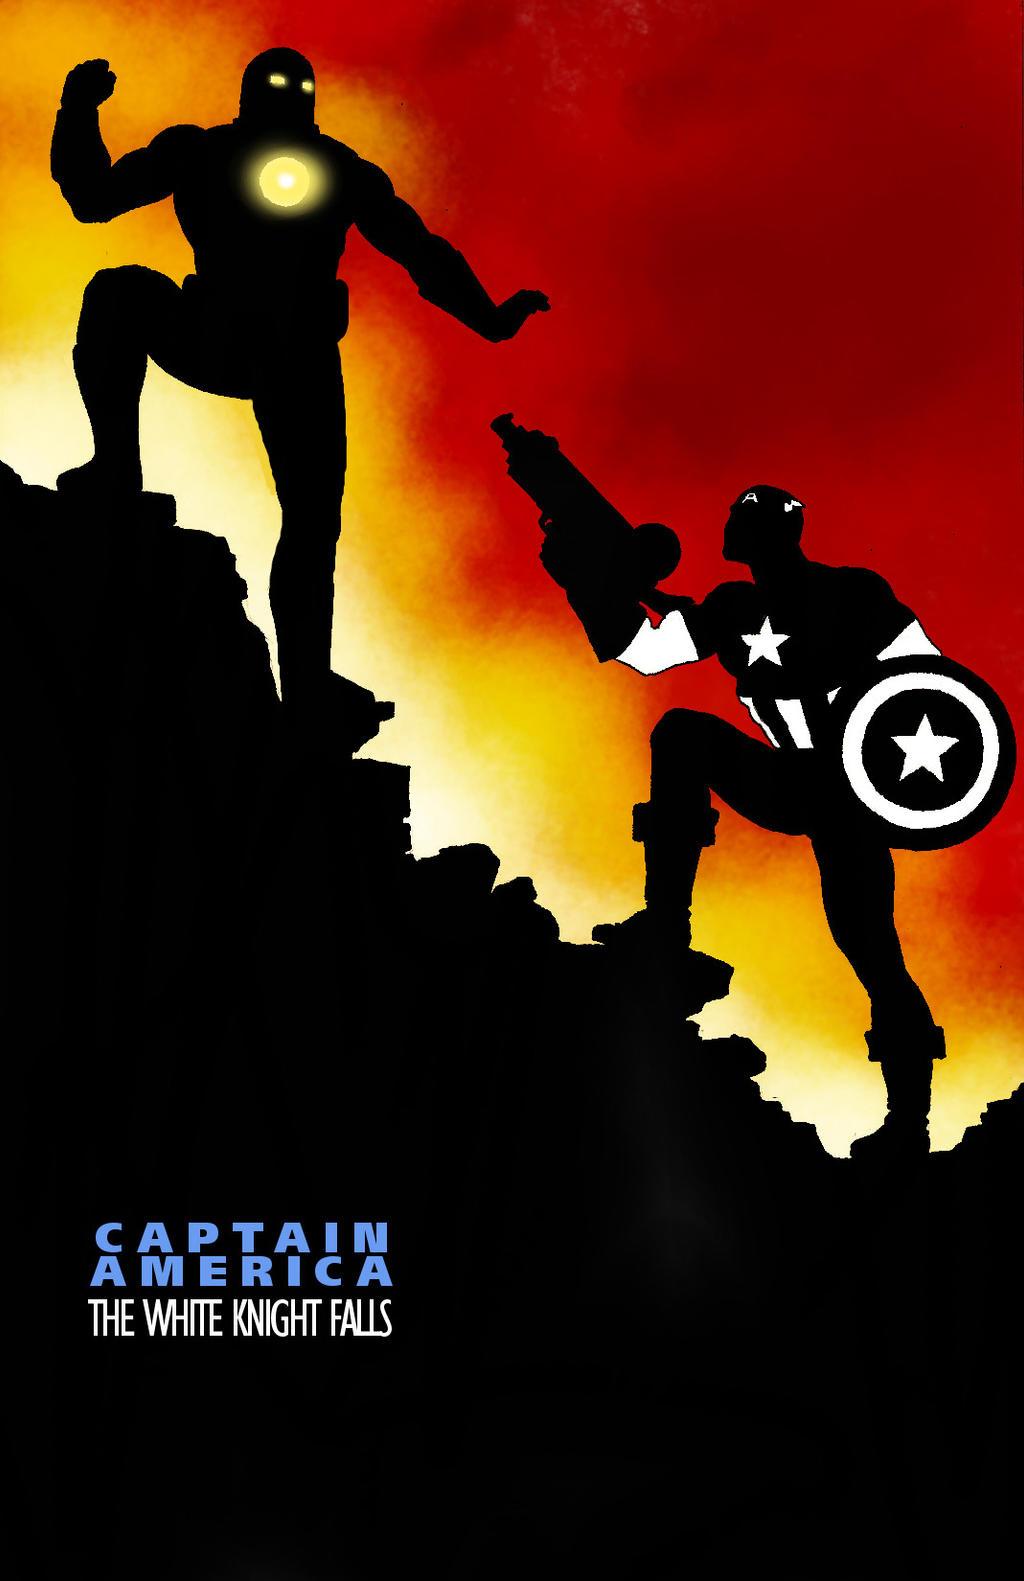 cover_homage_captain_america_in_dkr_4_by_nick_perks_d8x1fki-fullview.jpg